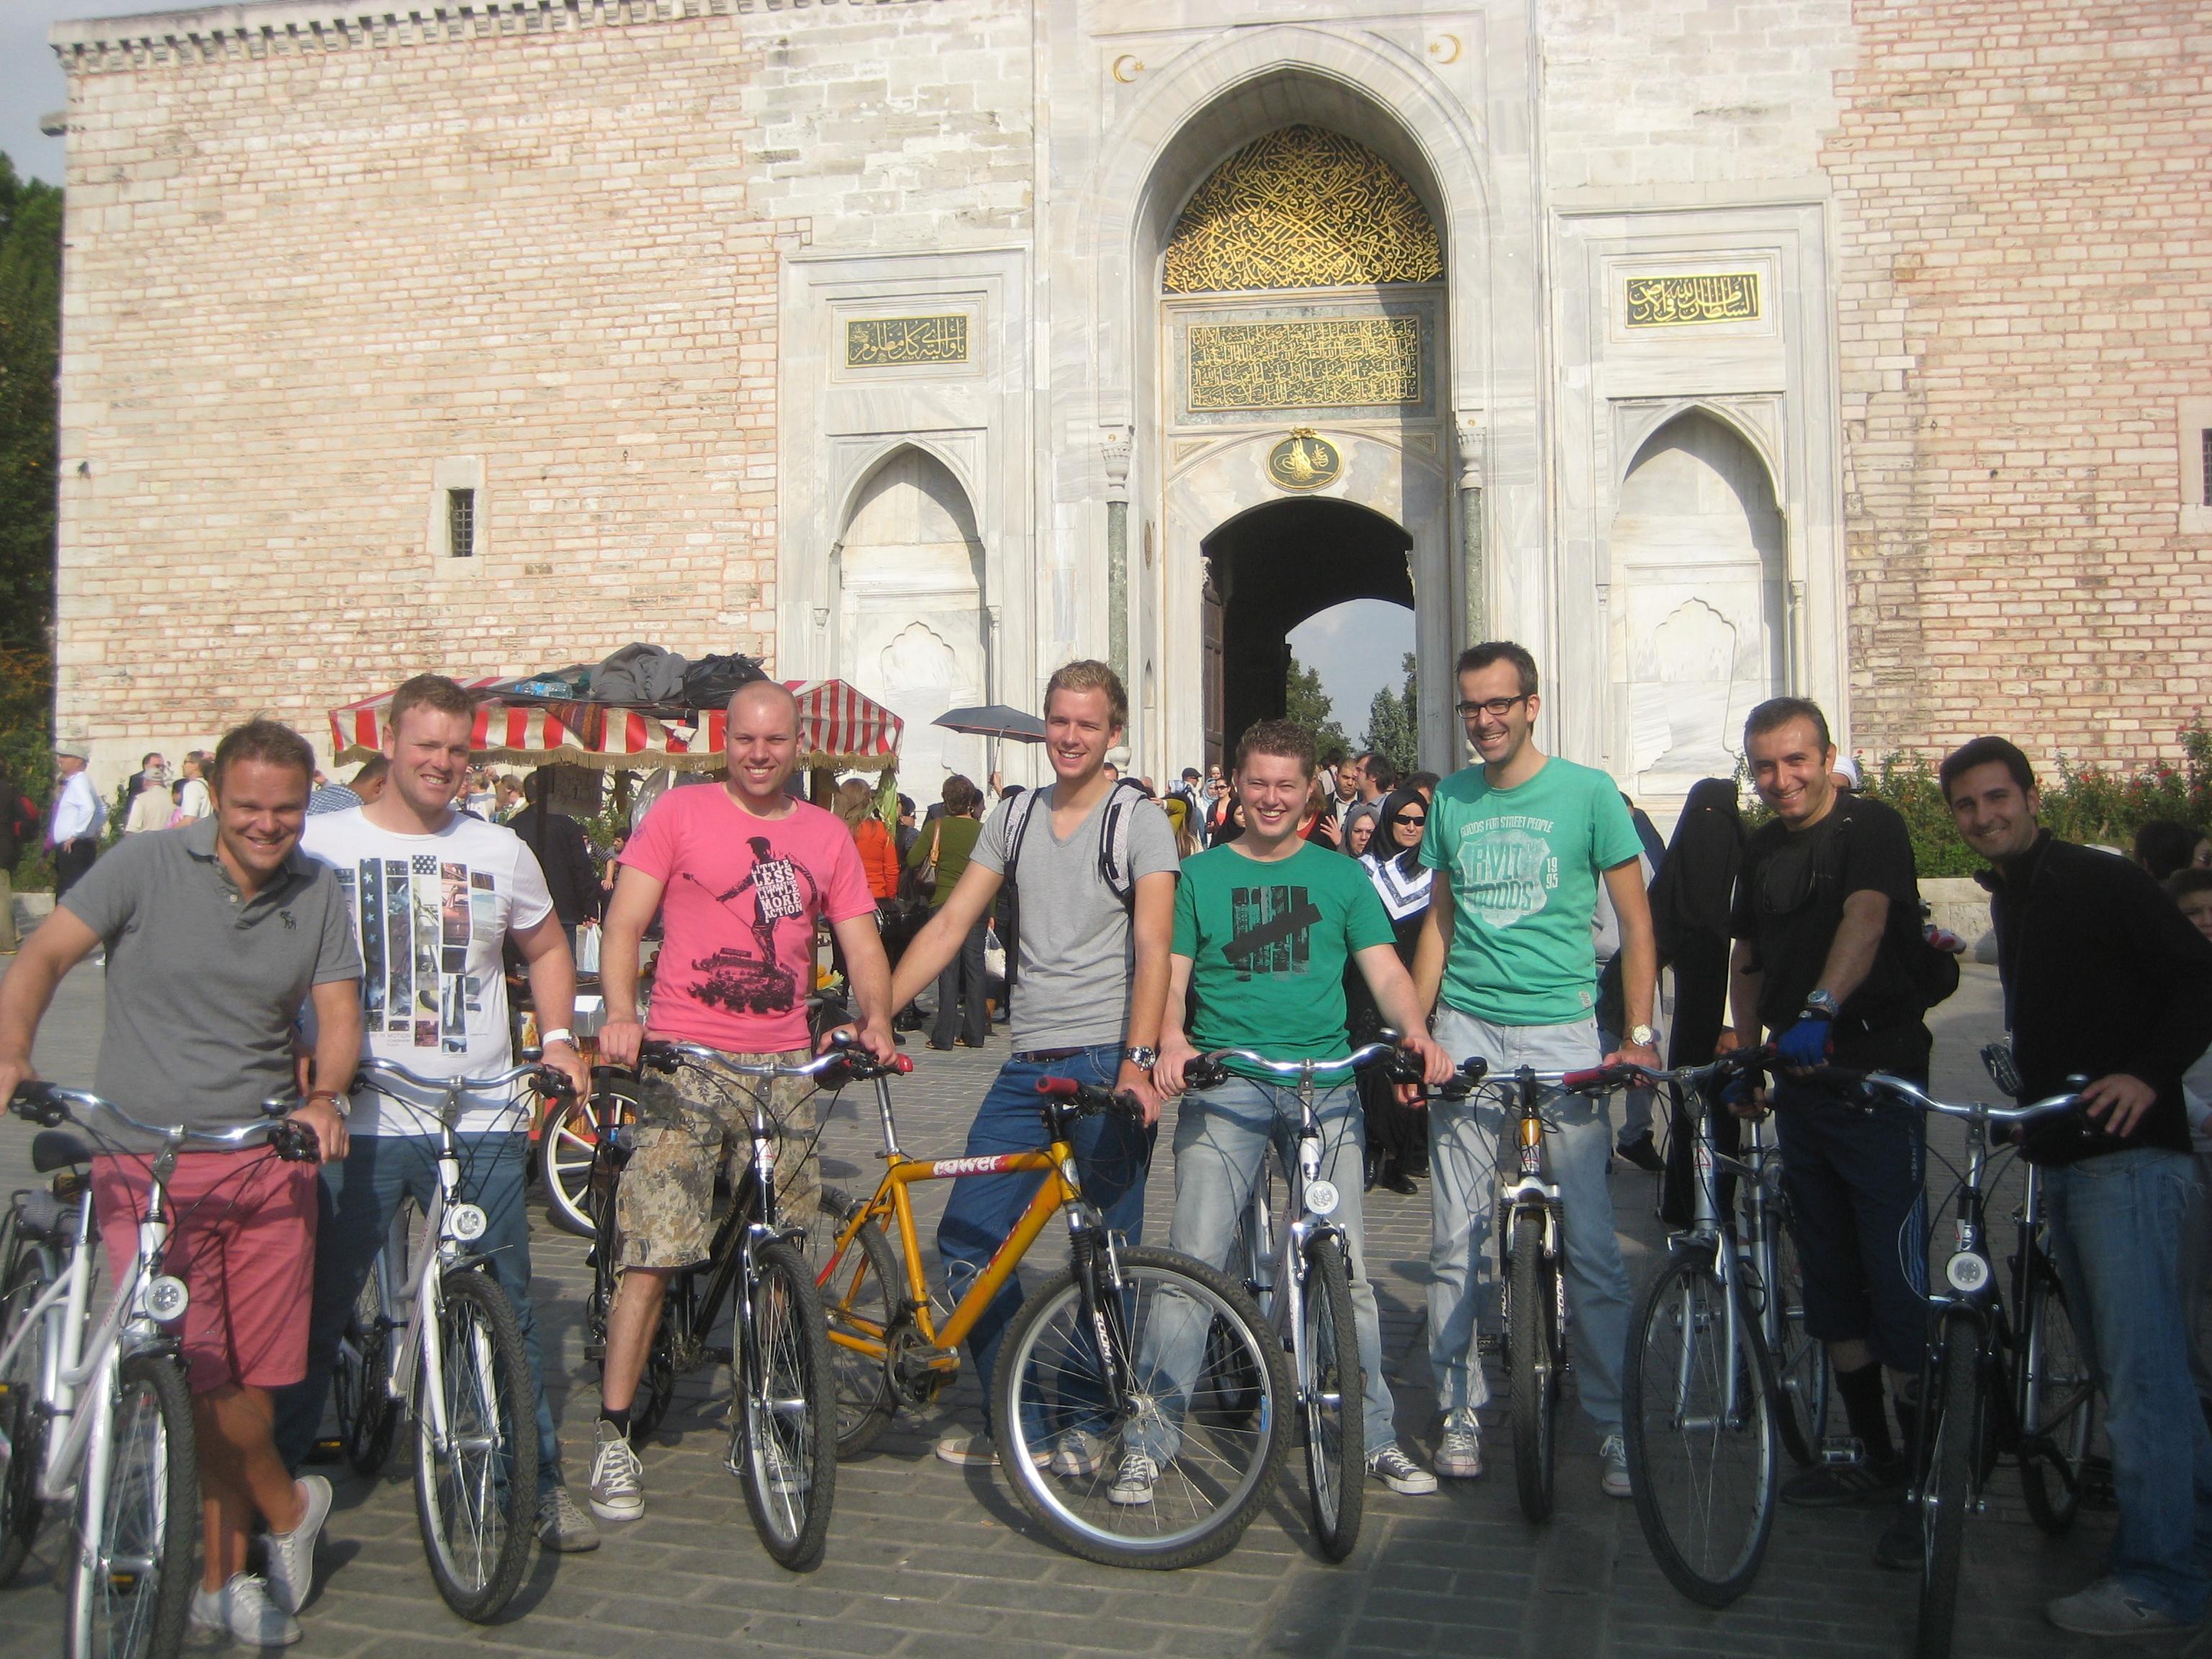 Martijn & Friends at Topkapi